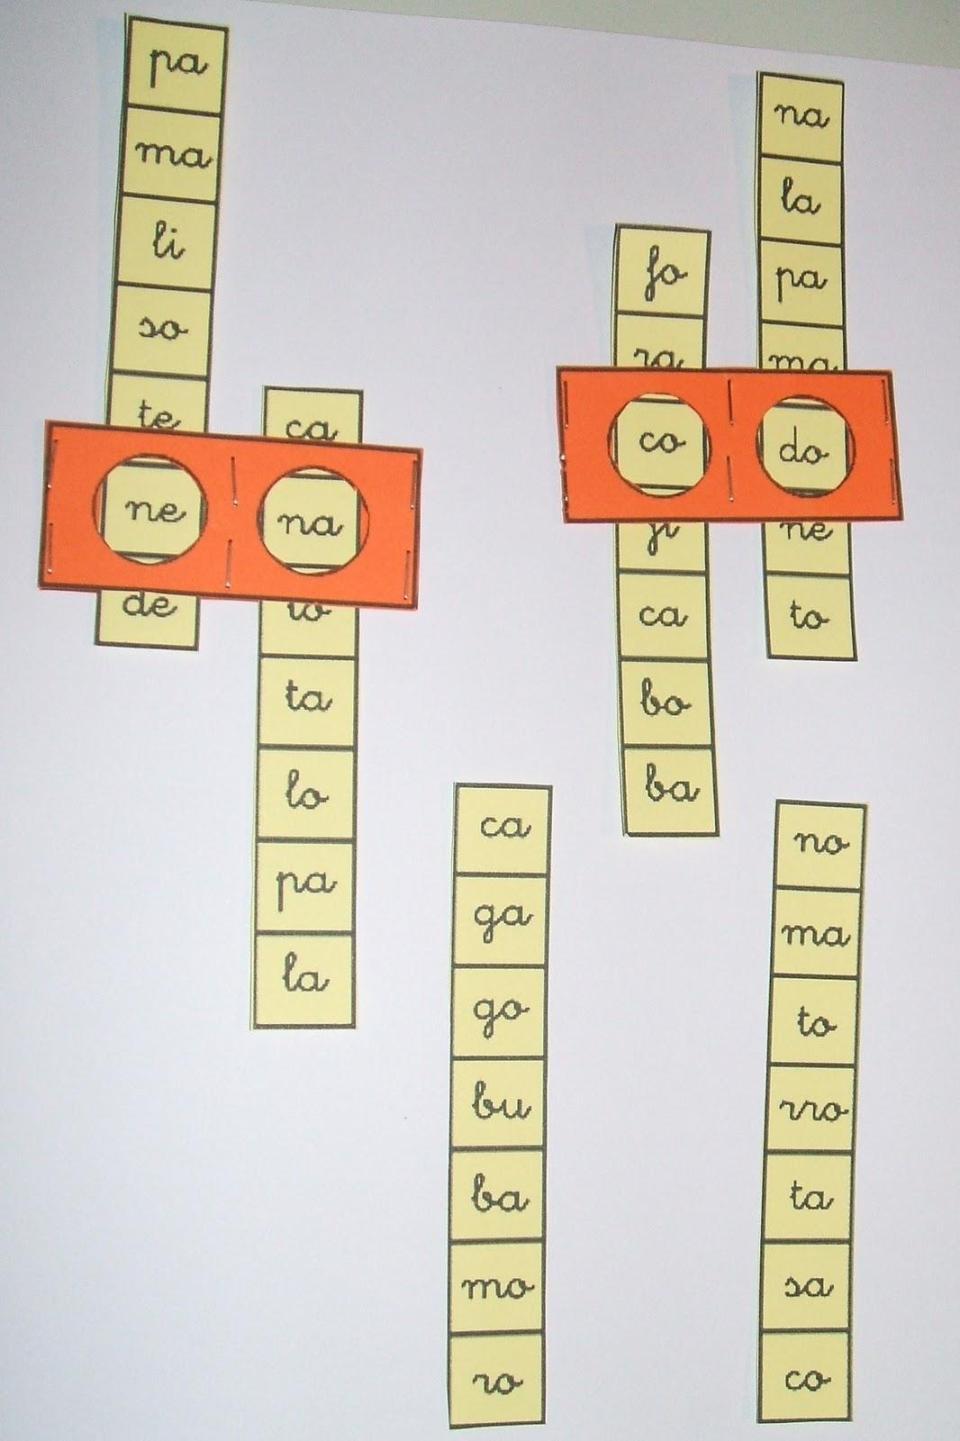 maquina fabricar palabras - lectoescritura